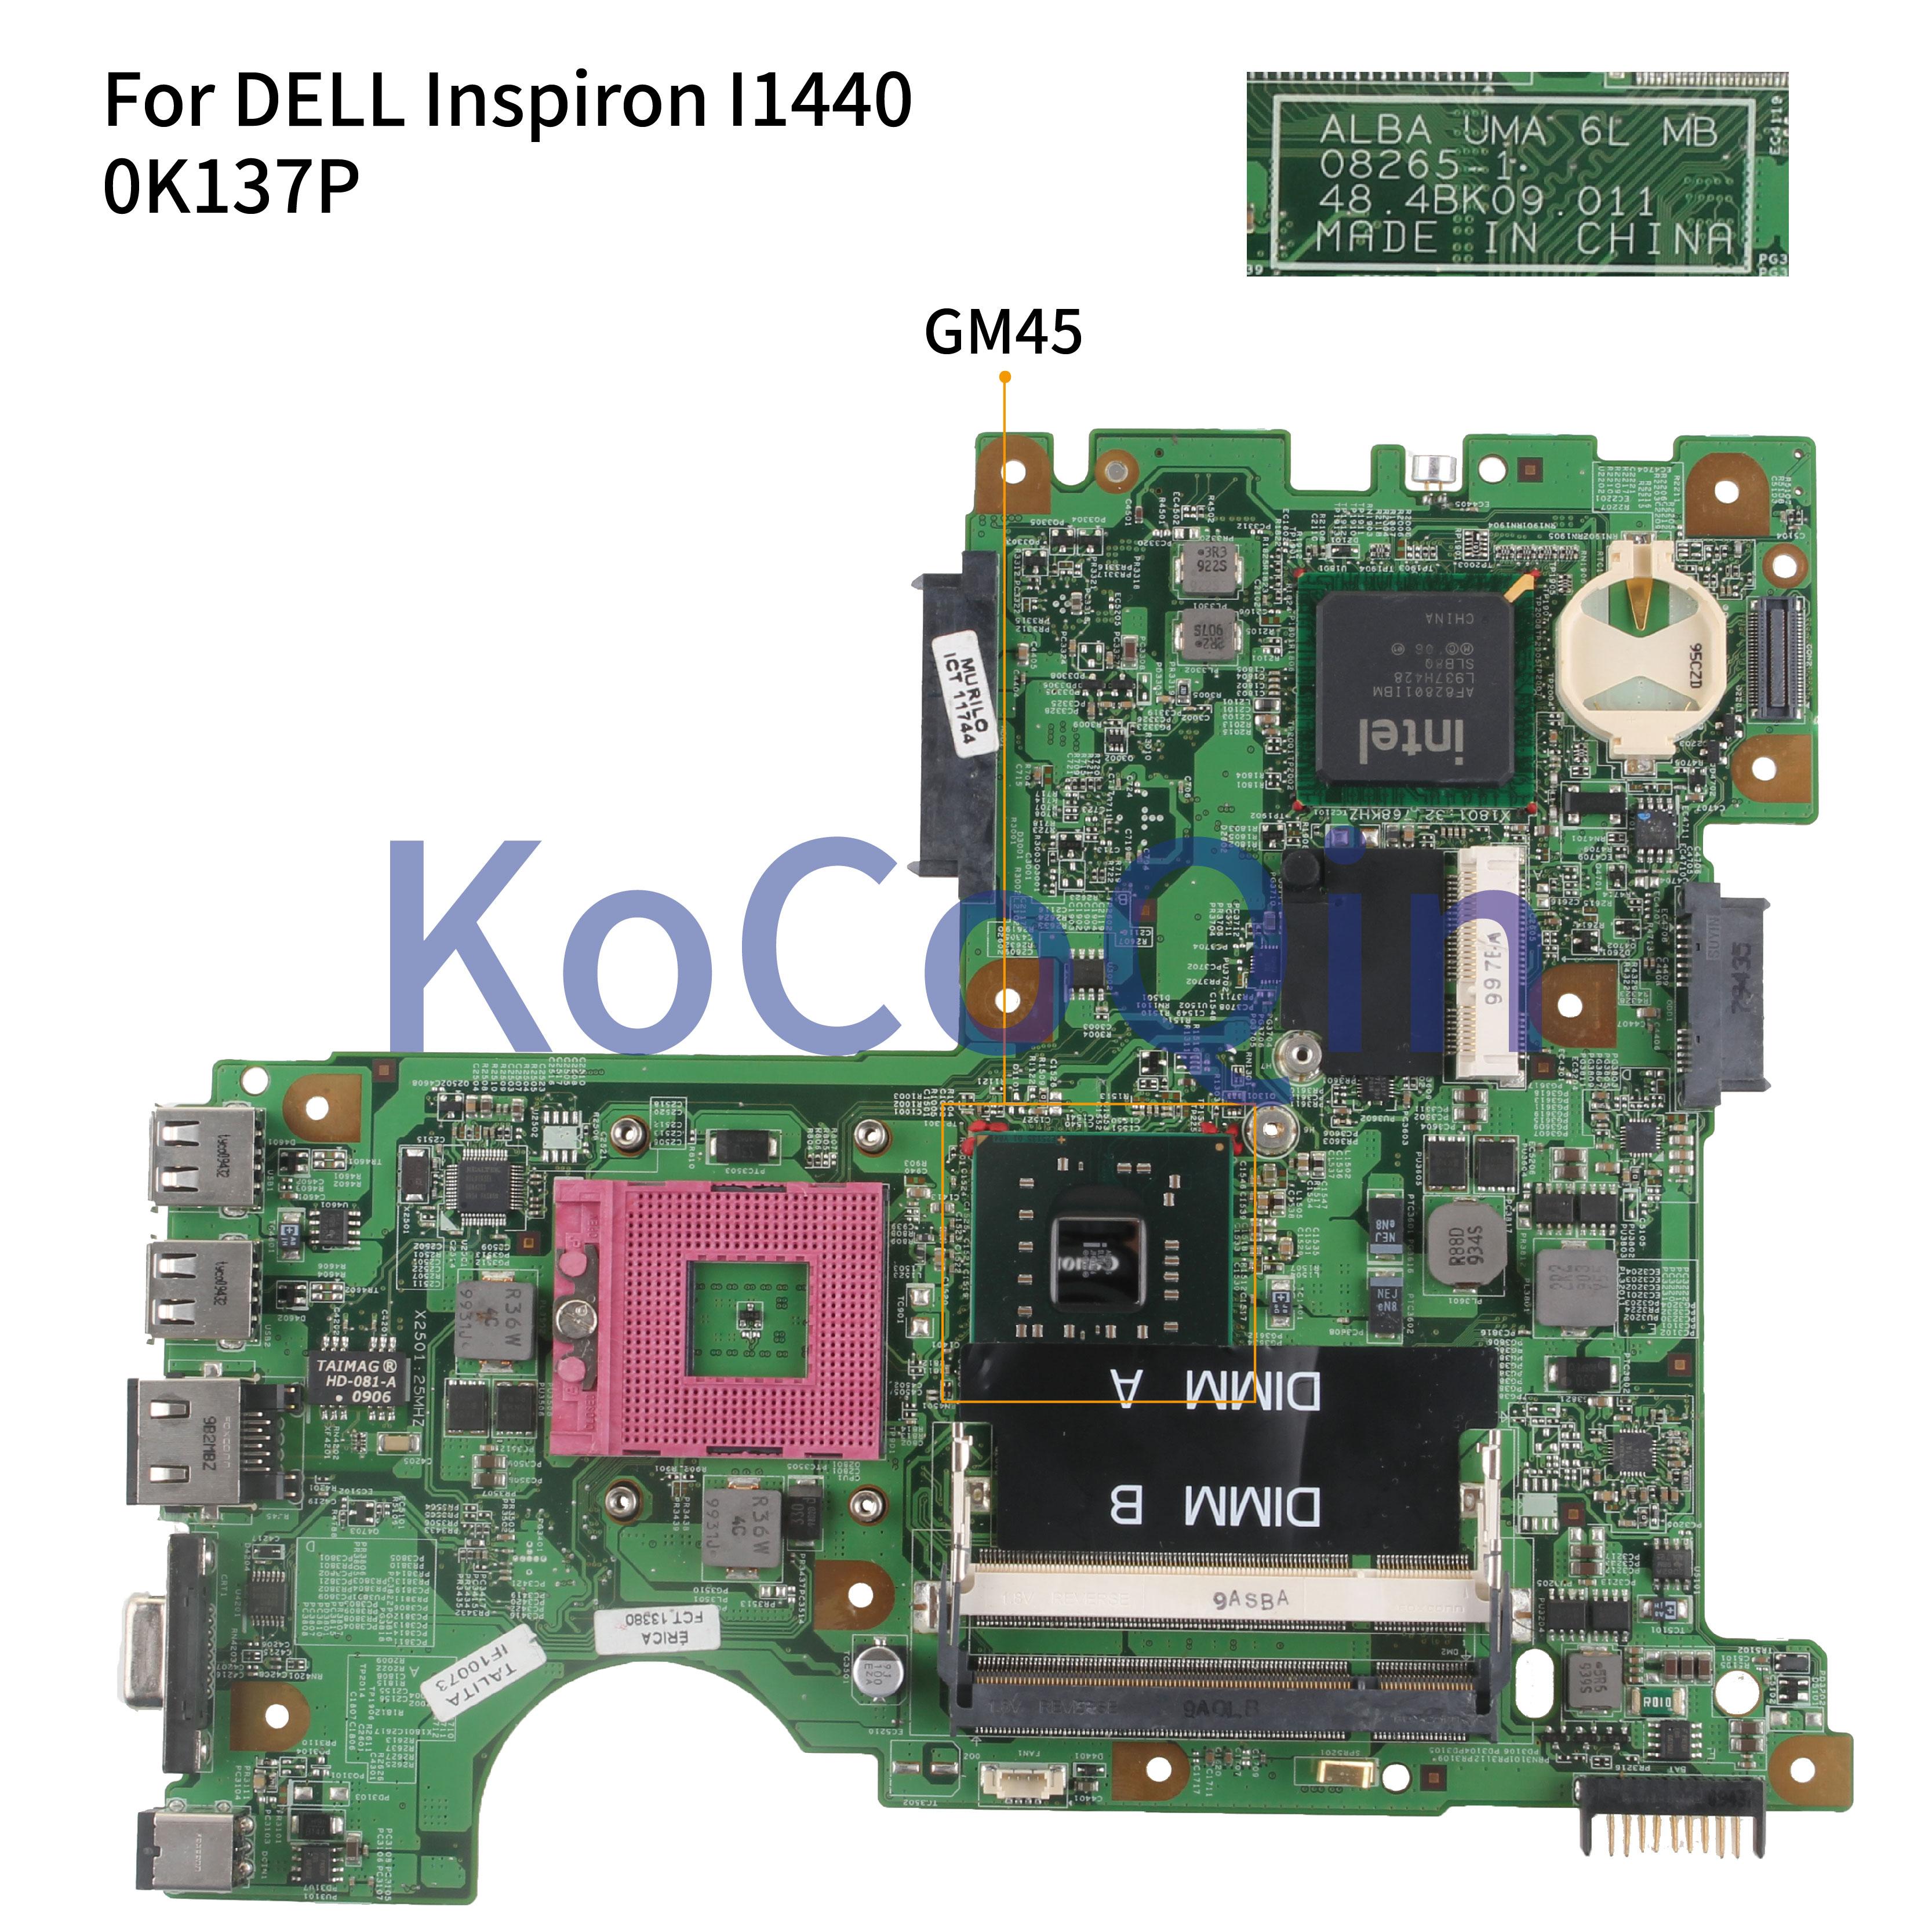 KoCoQin Laptop Motherboard For DELL Inspiron 1440 I1440 Mainboard CN-0K137P 0K137P 08265-1 48.4BK09.011 GM45